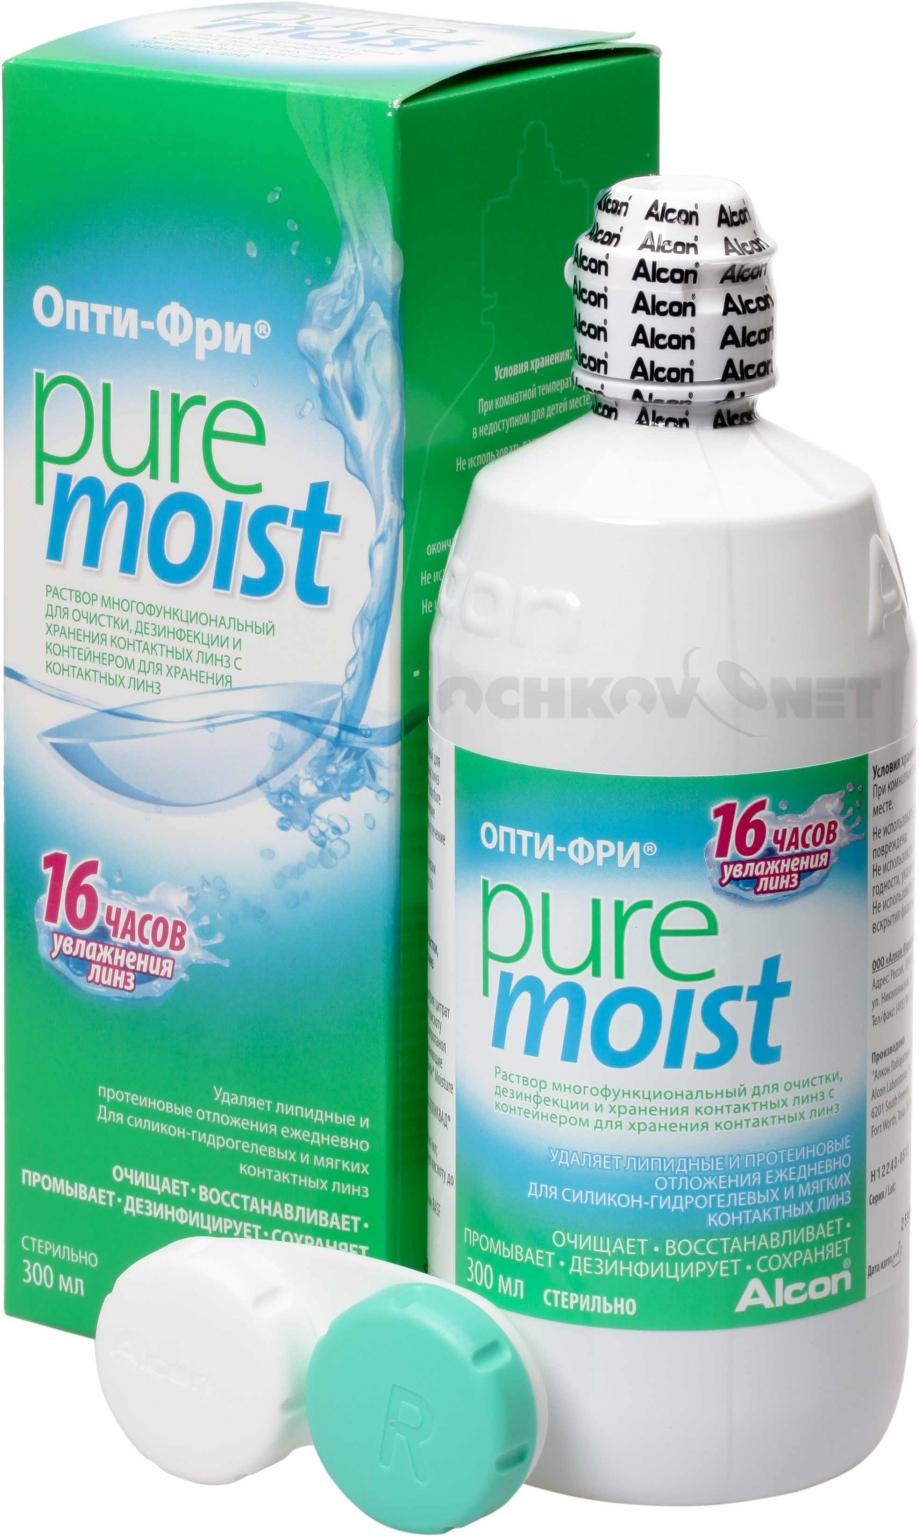 Раствор Opti-Free Pure Moist 300 мл